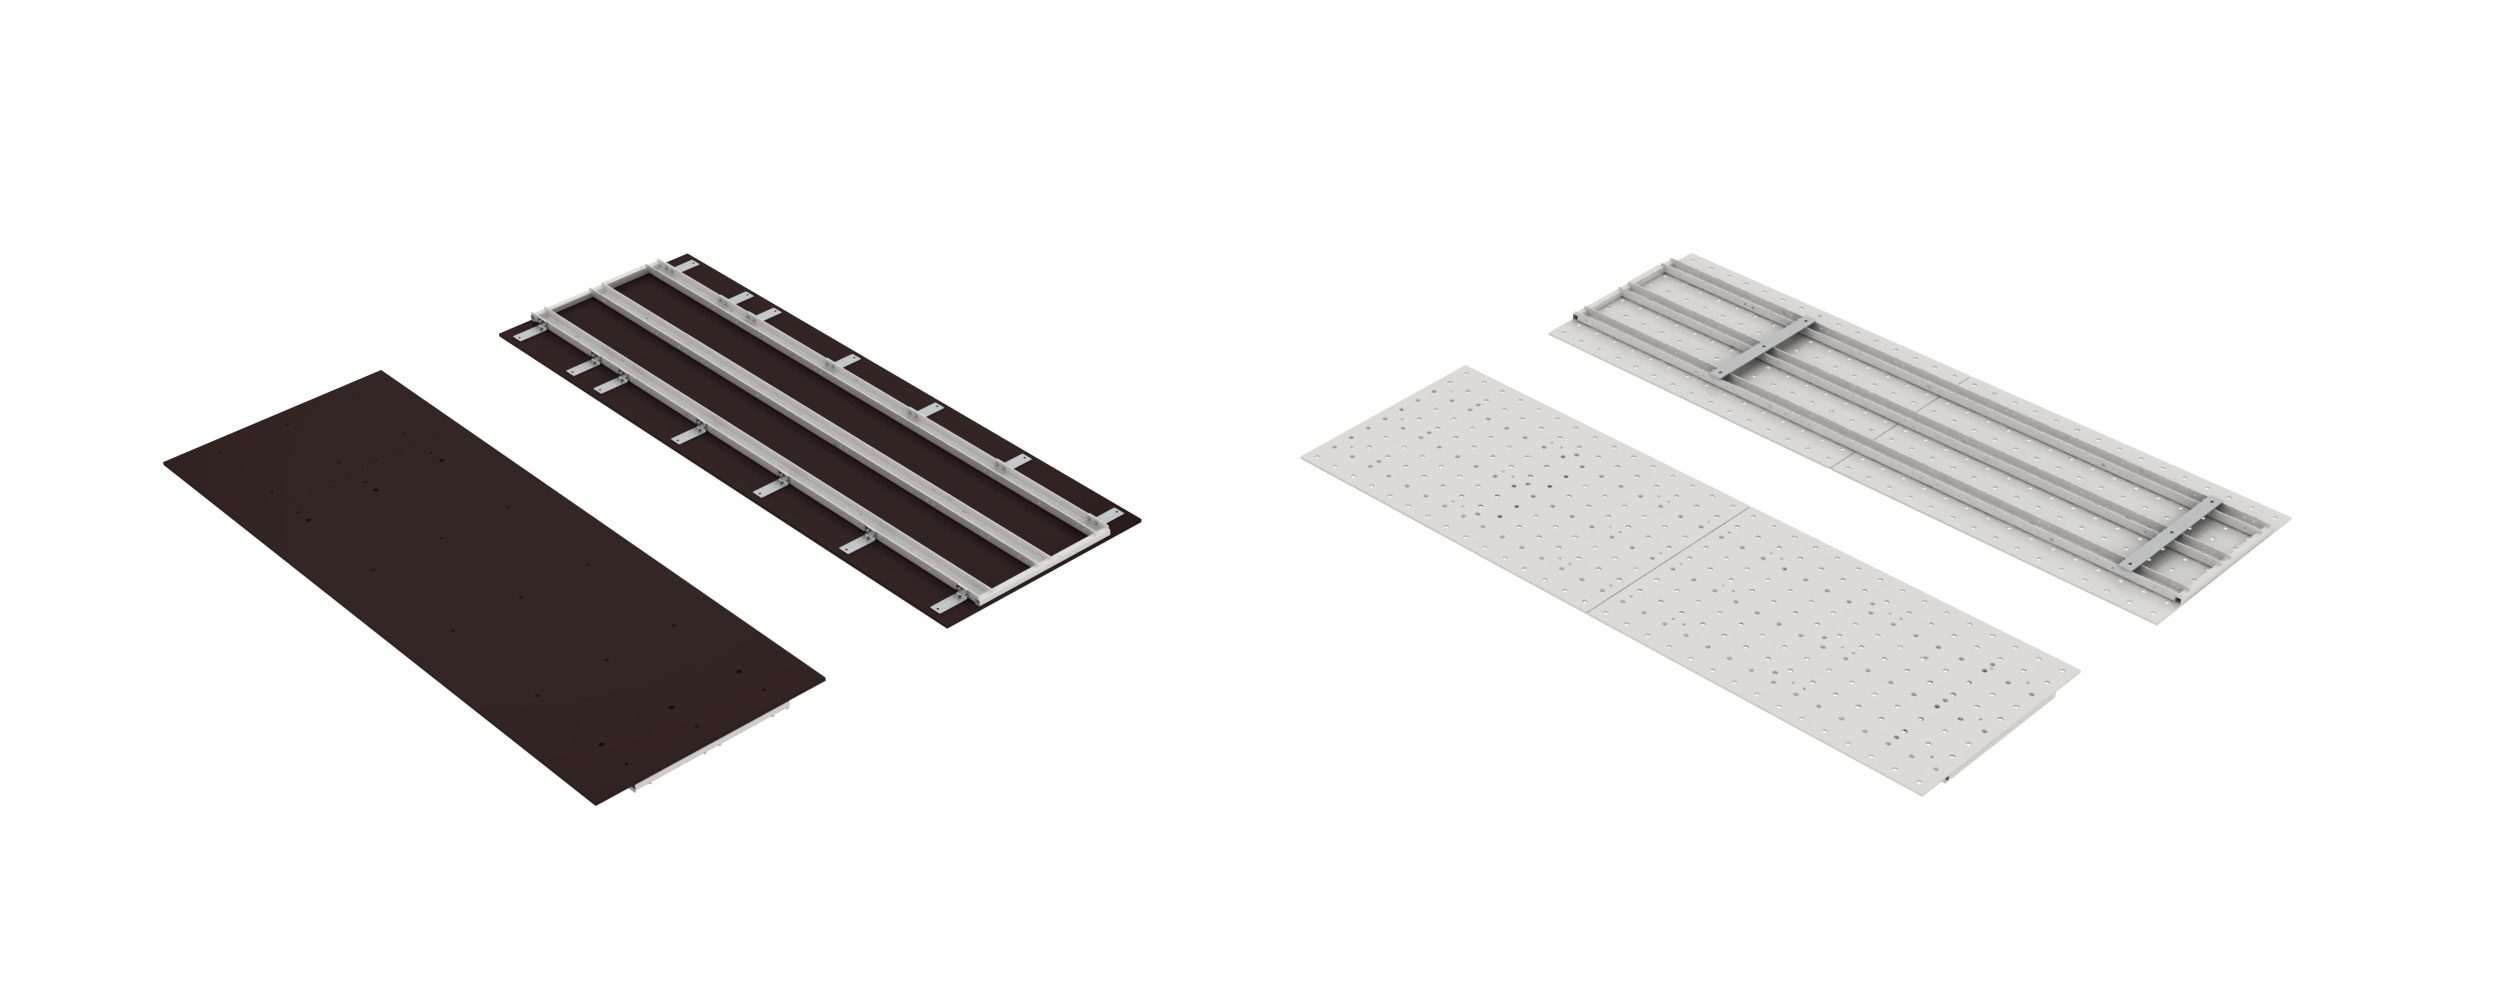 Soukup FRAMER Modular plywood panel and steel raster board